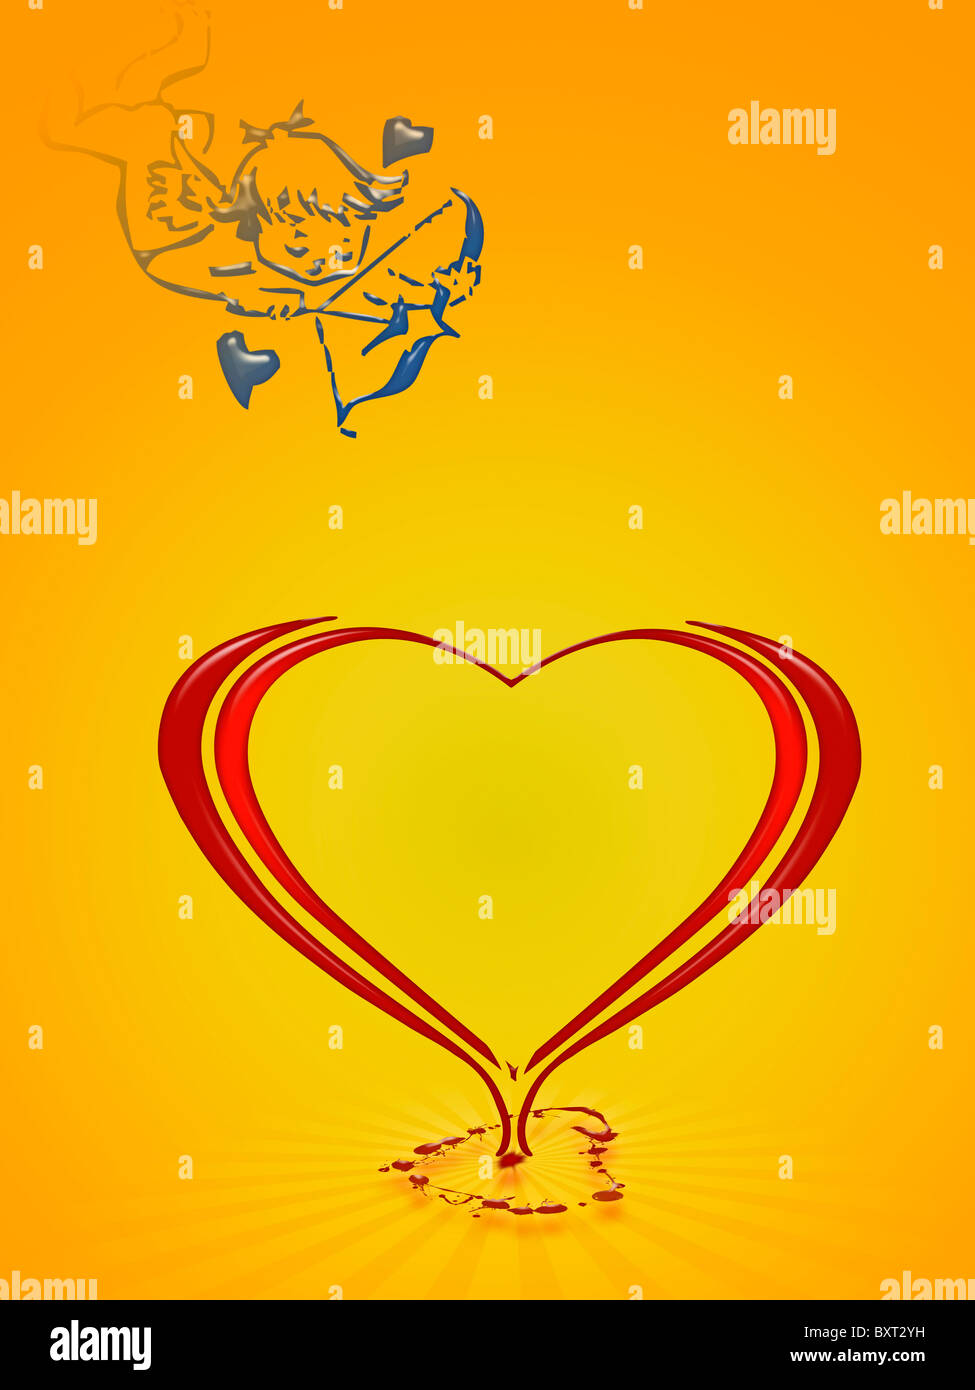 San Valentine Day Images Stockfotos & San Valentine Day Images ...